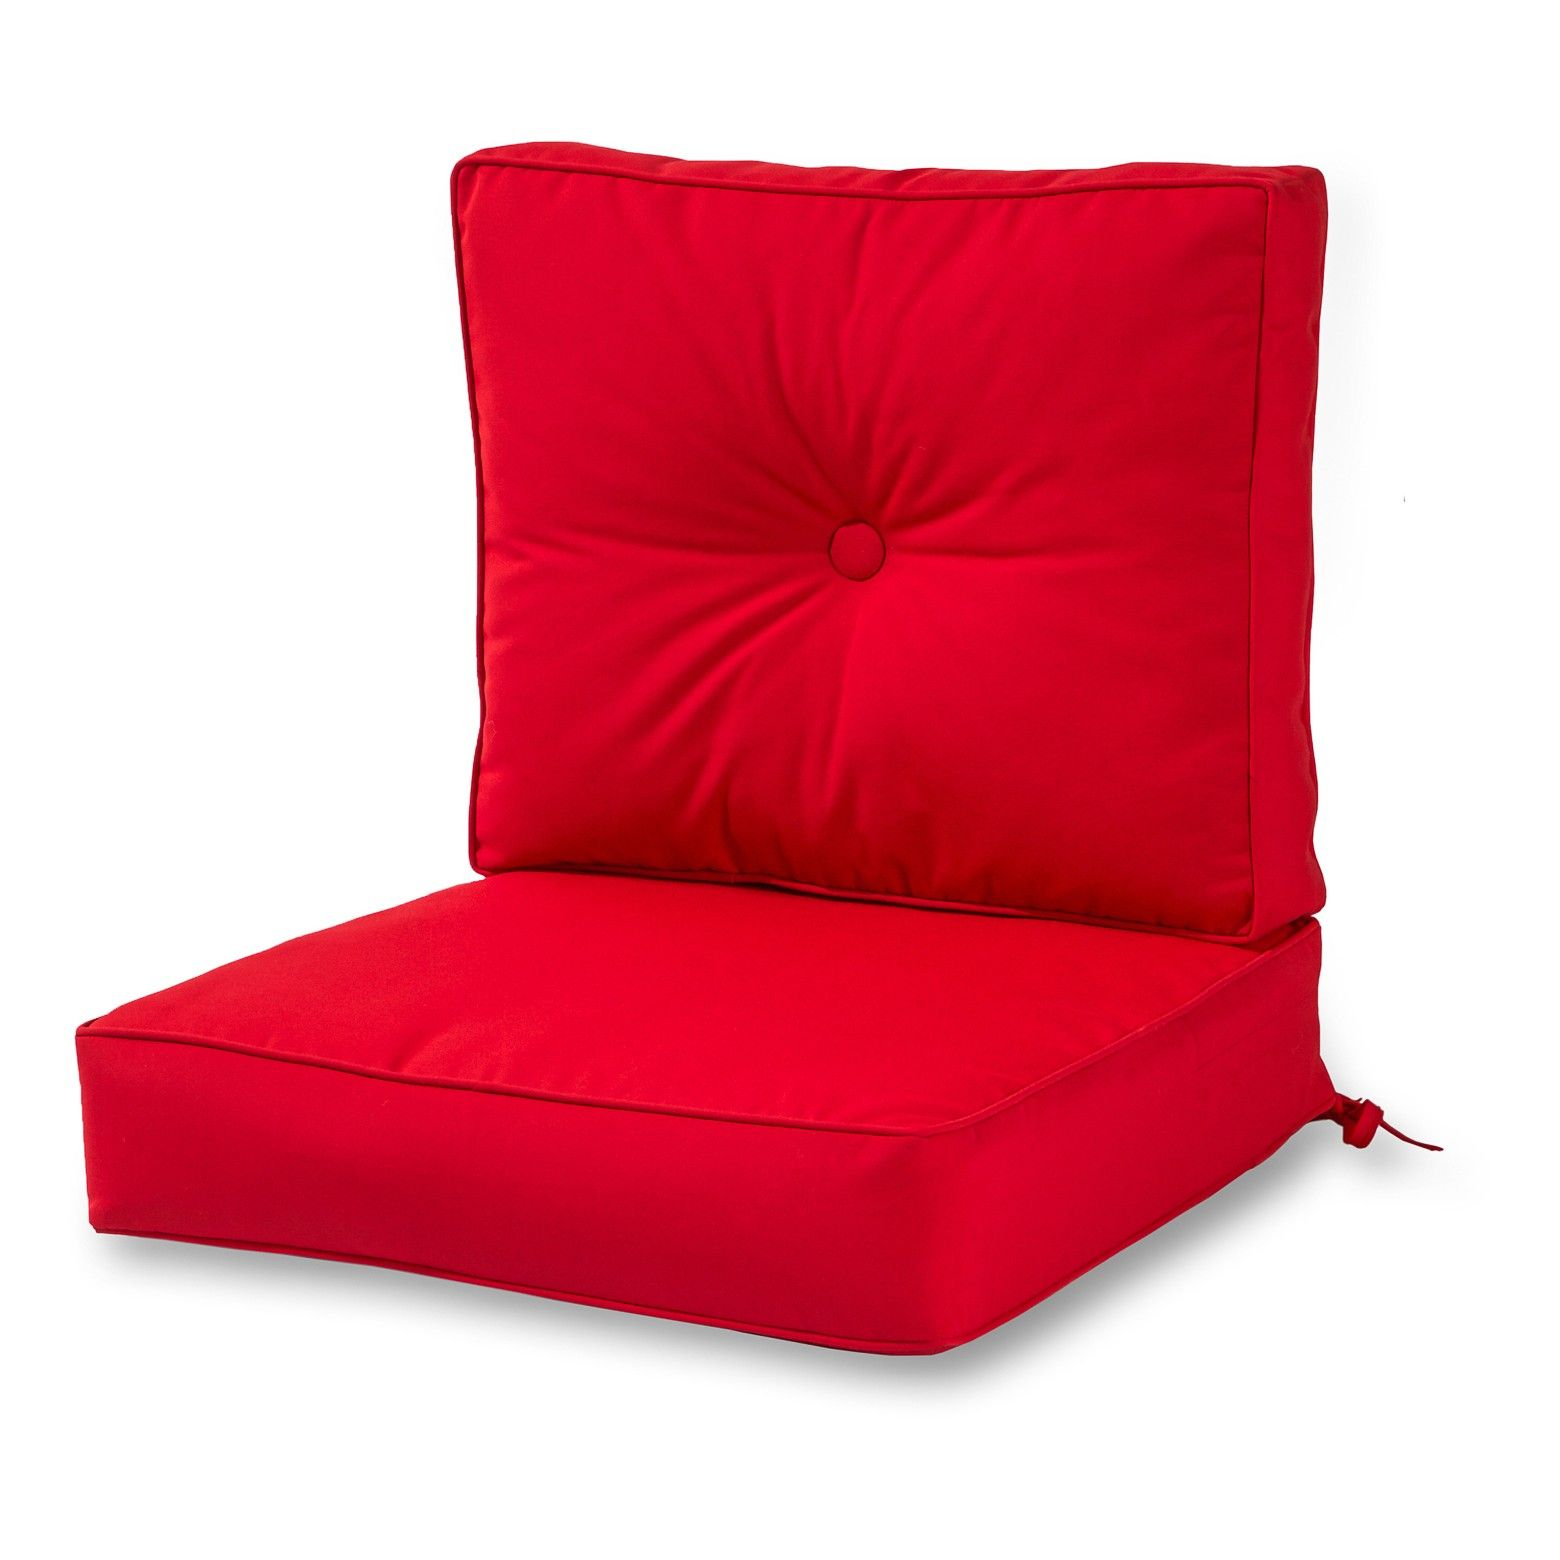 2pc Outdoor Sunbrella Deep Seat Cushion Set Kensington Garden Outdoor Deep Seat Cushions Deep Seat Cushions Outdoor Lounge Chair Cushions